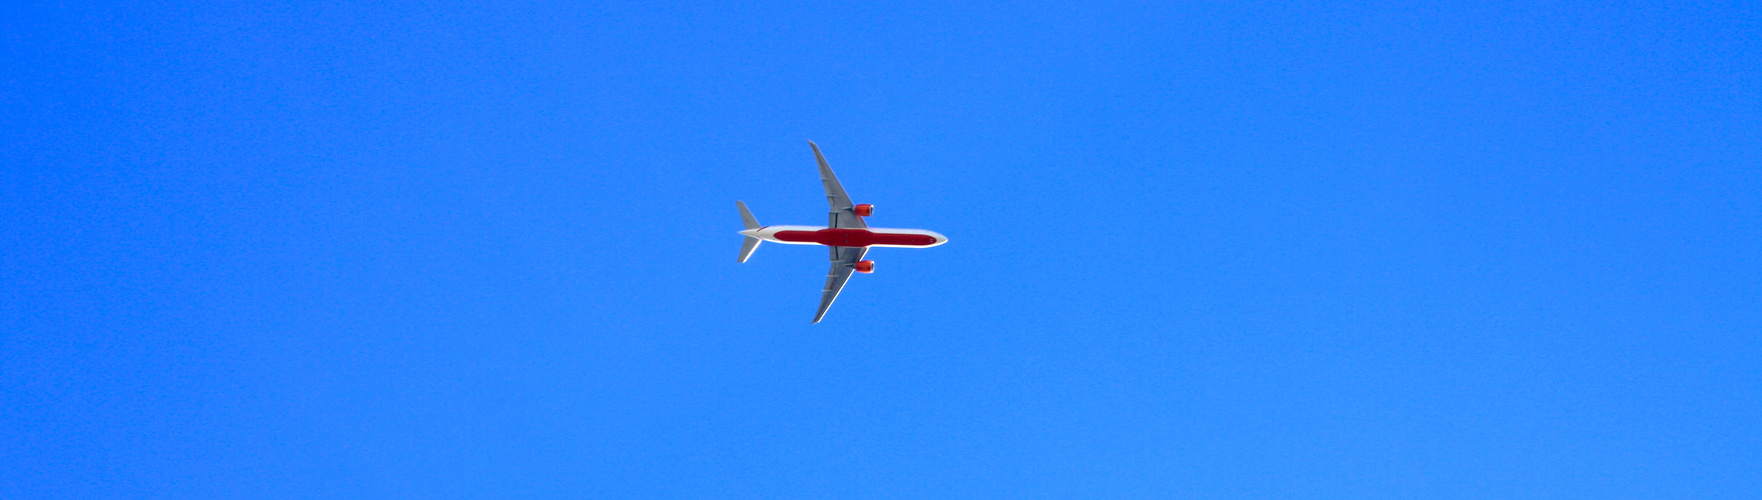 plane in a blue sky